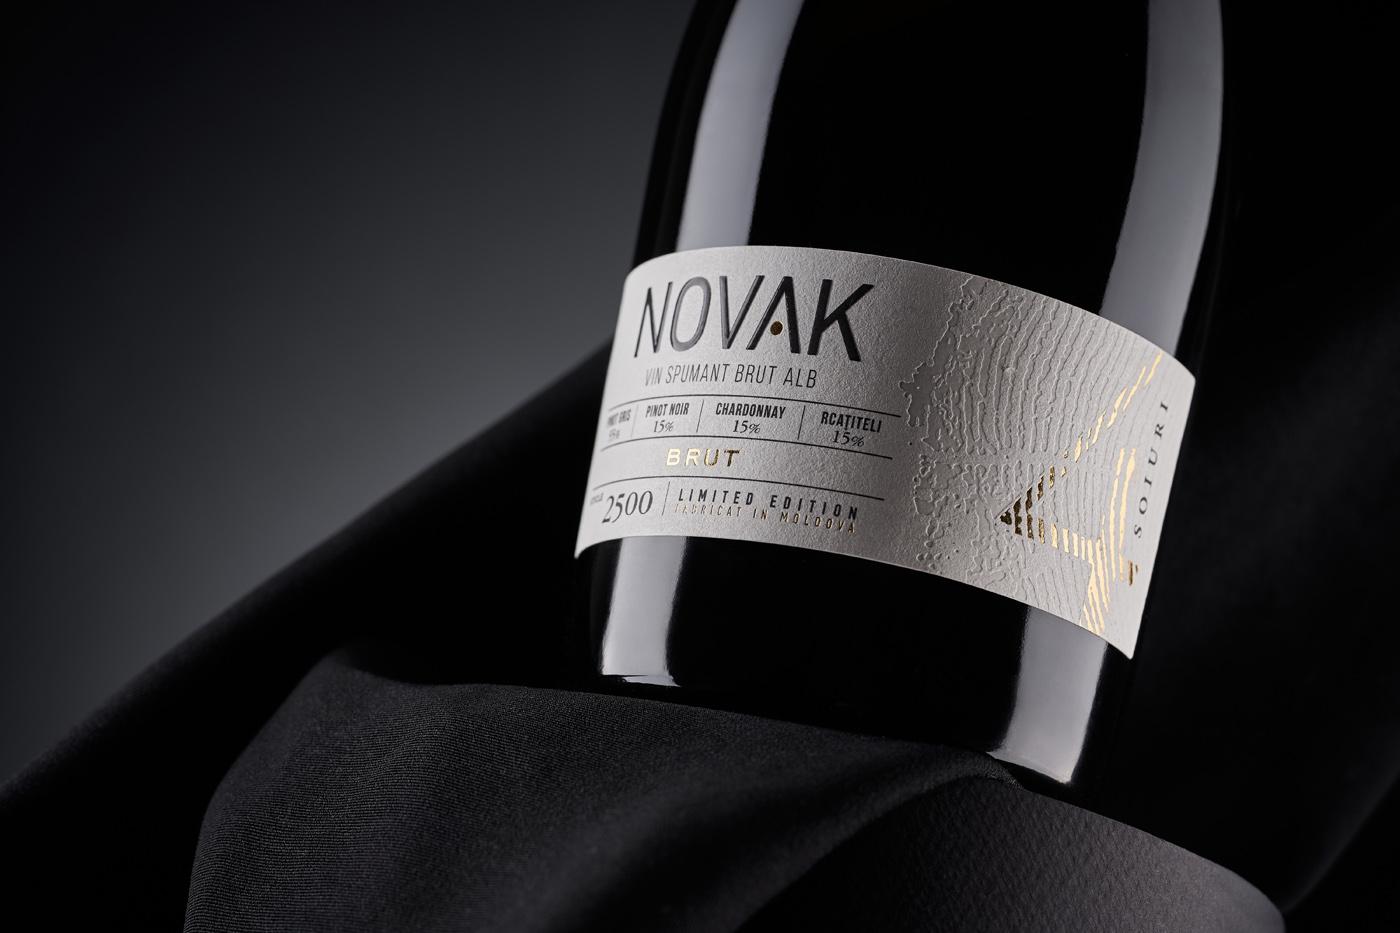 Sparkling Wine Label Design for Novak Spumant Created 43oz Design Studio